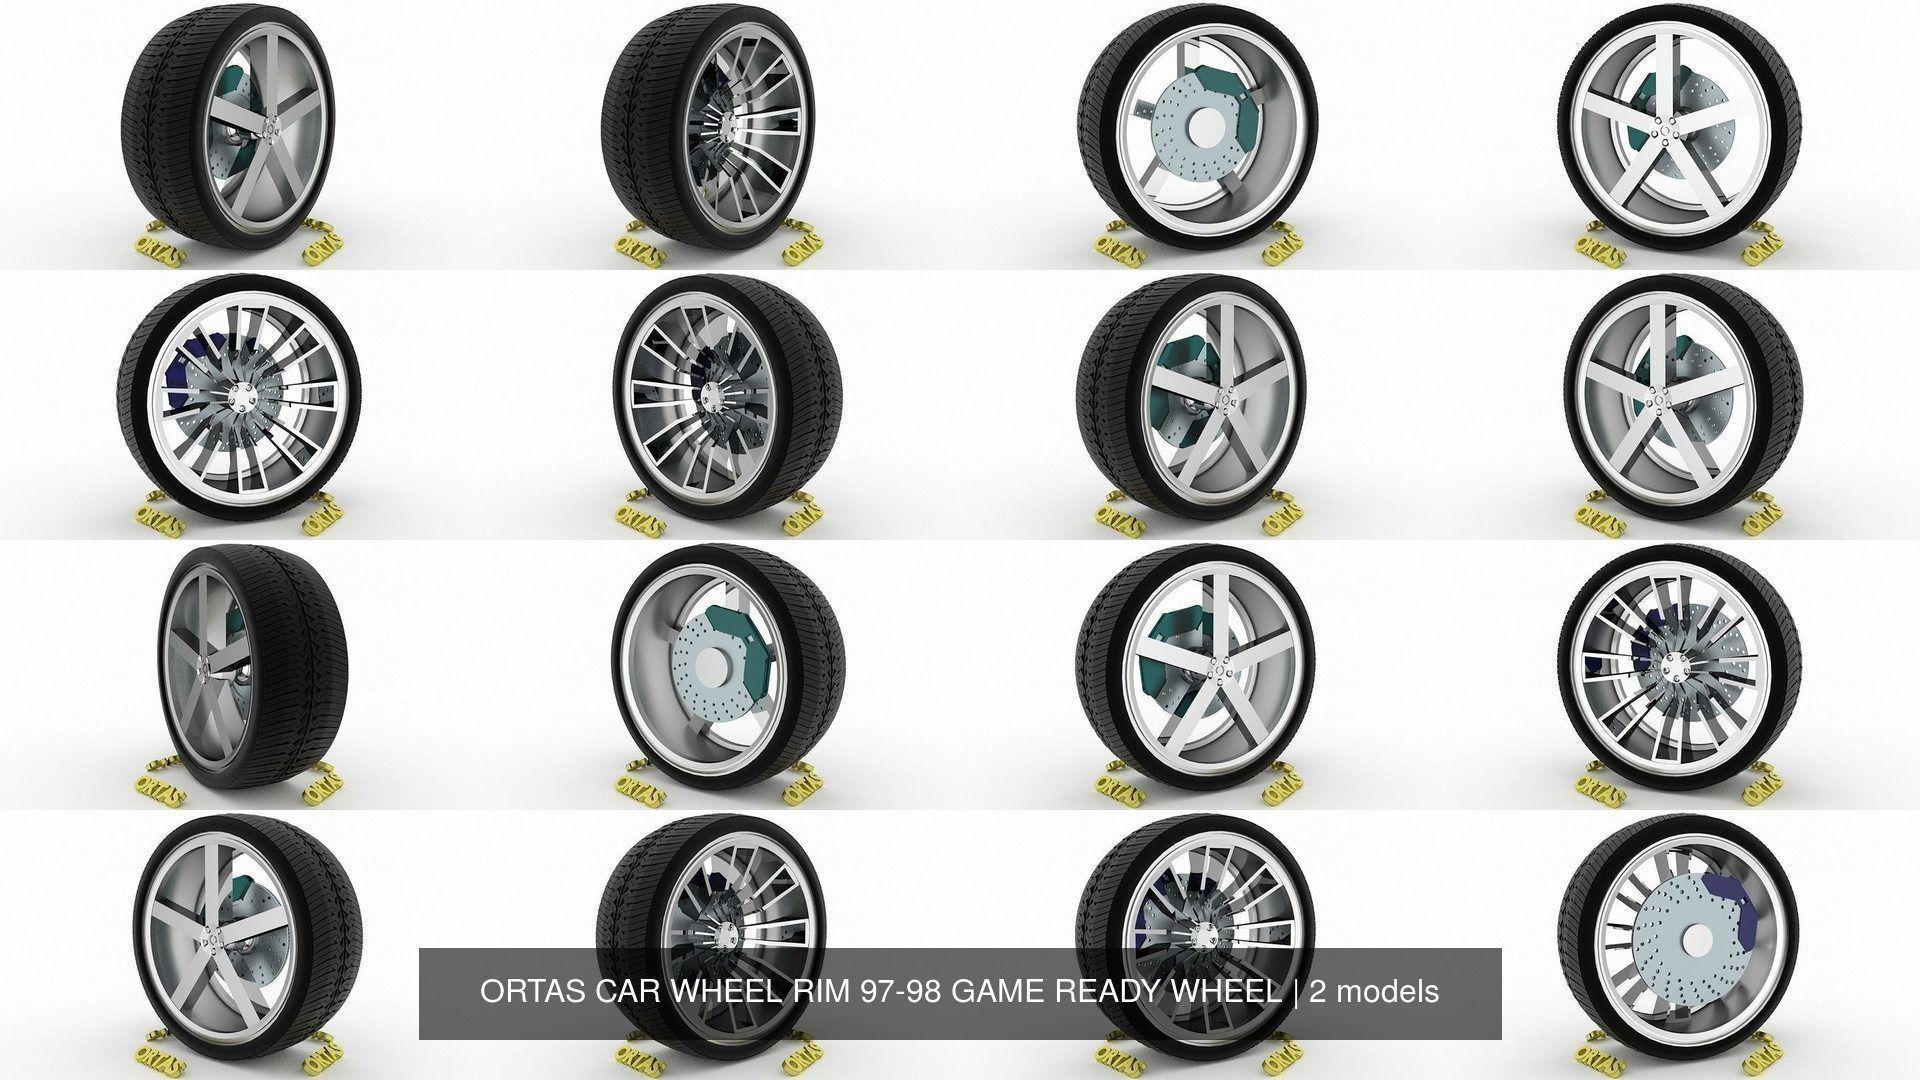 ORTAS CAR WHEEL RIM 97-98 GAME READY WHEEL